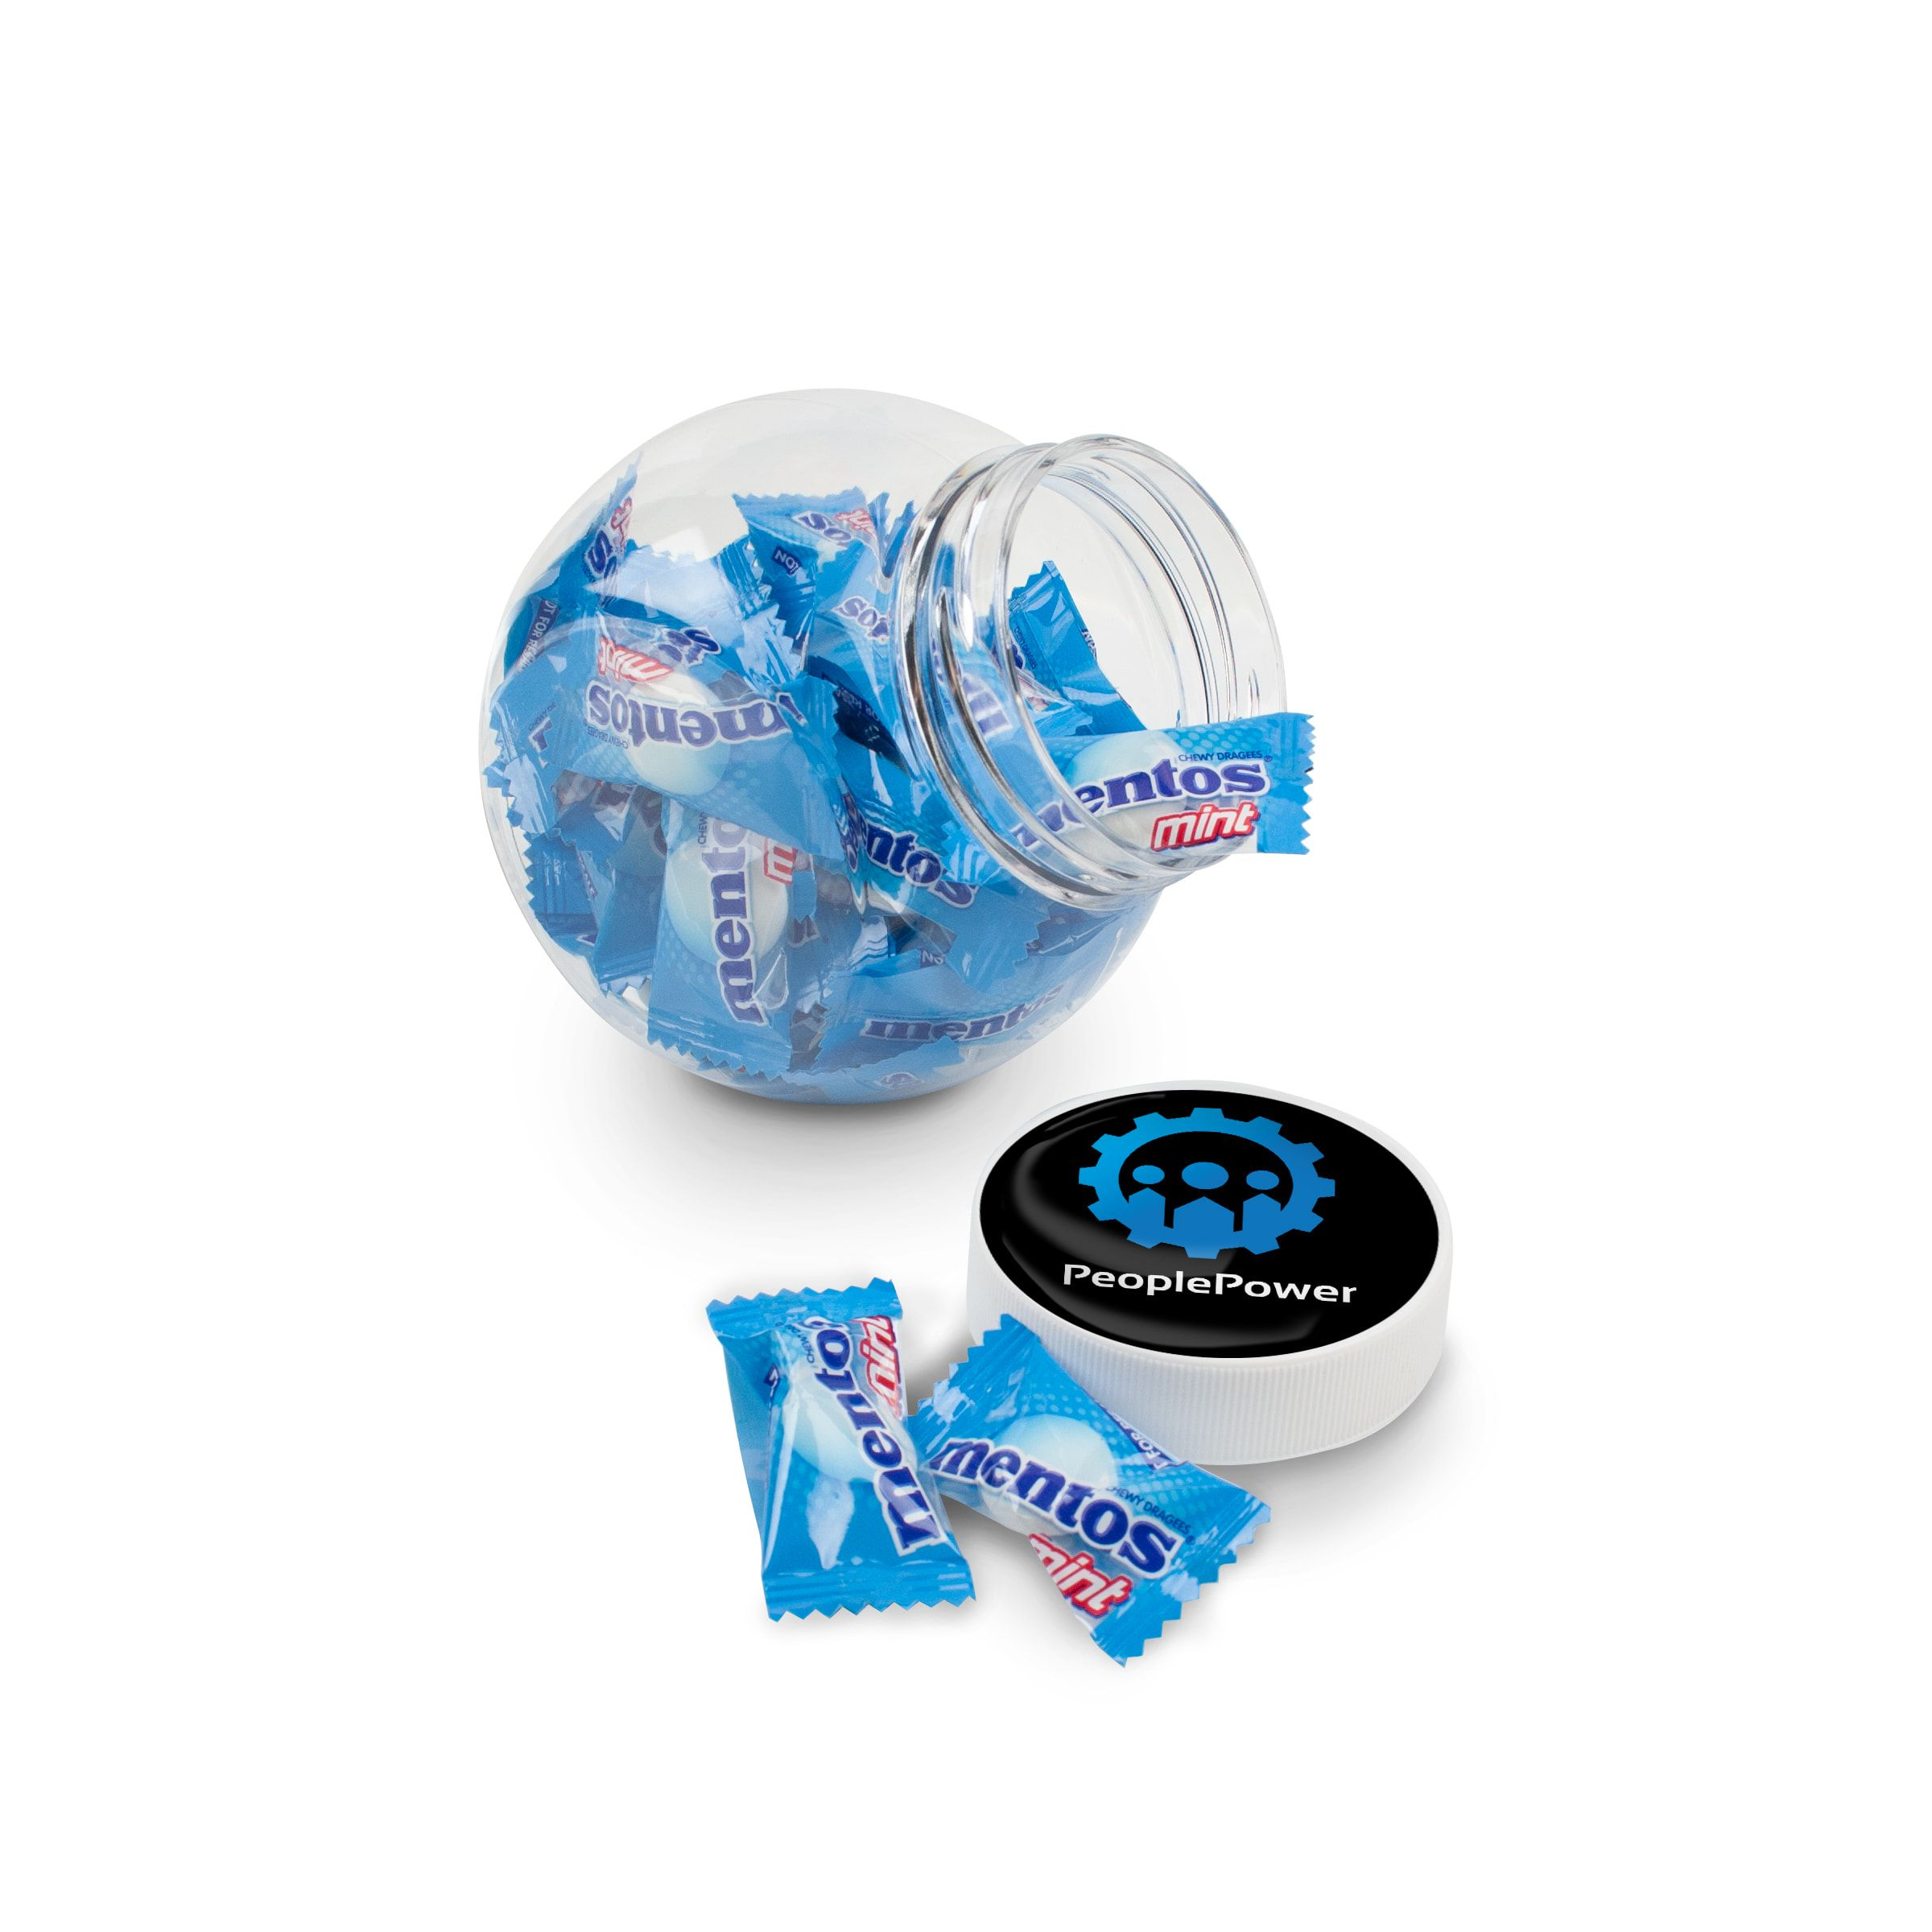 Boîte de bonbons Mentos